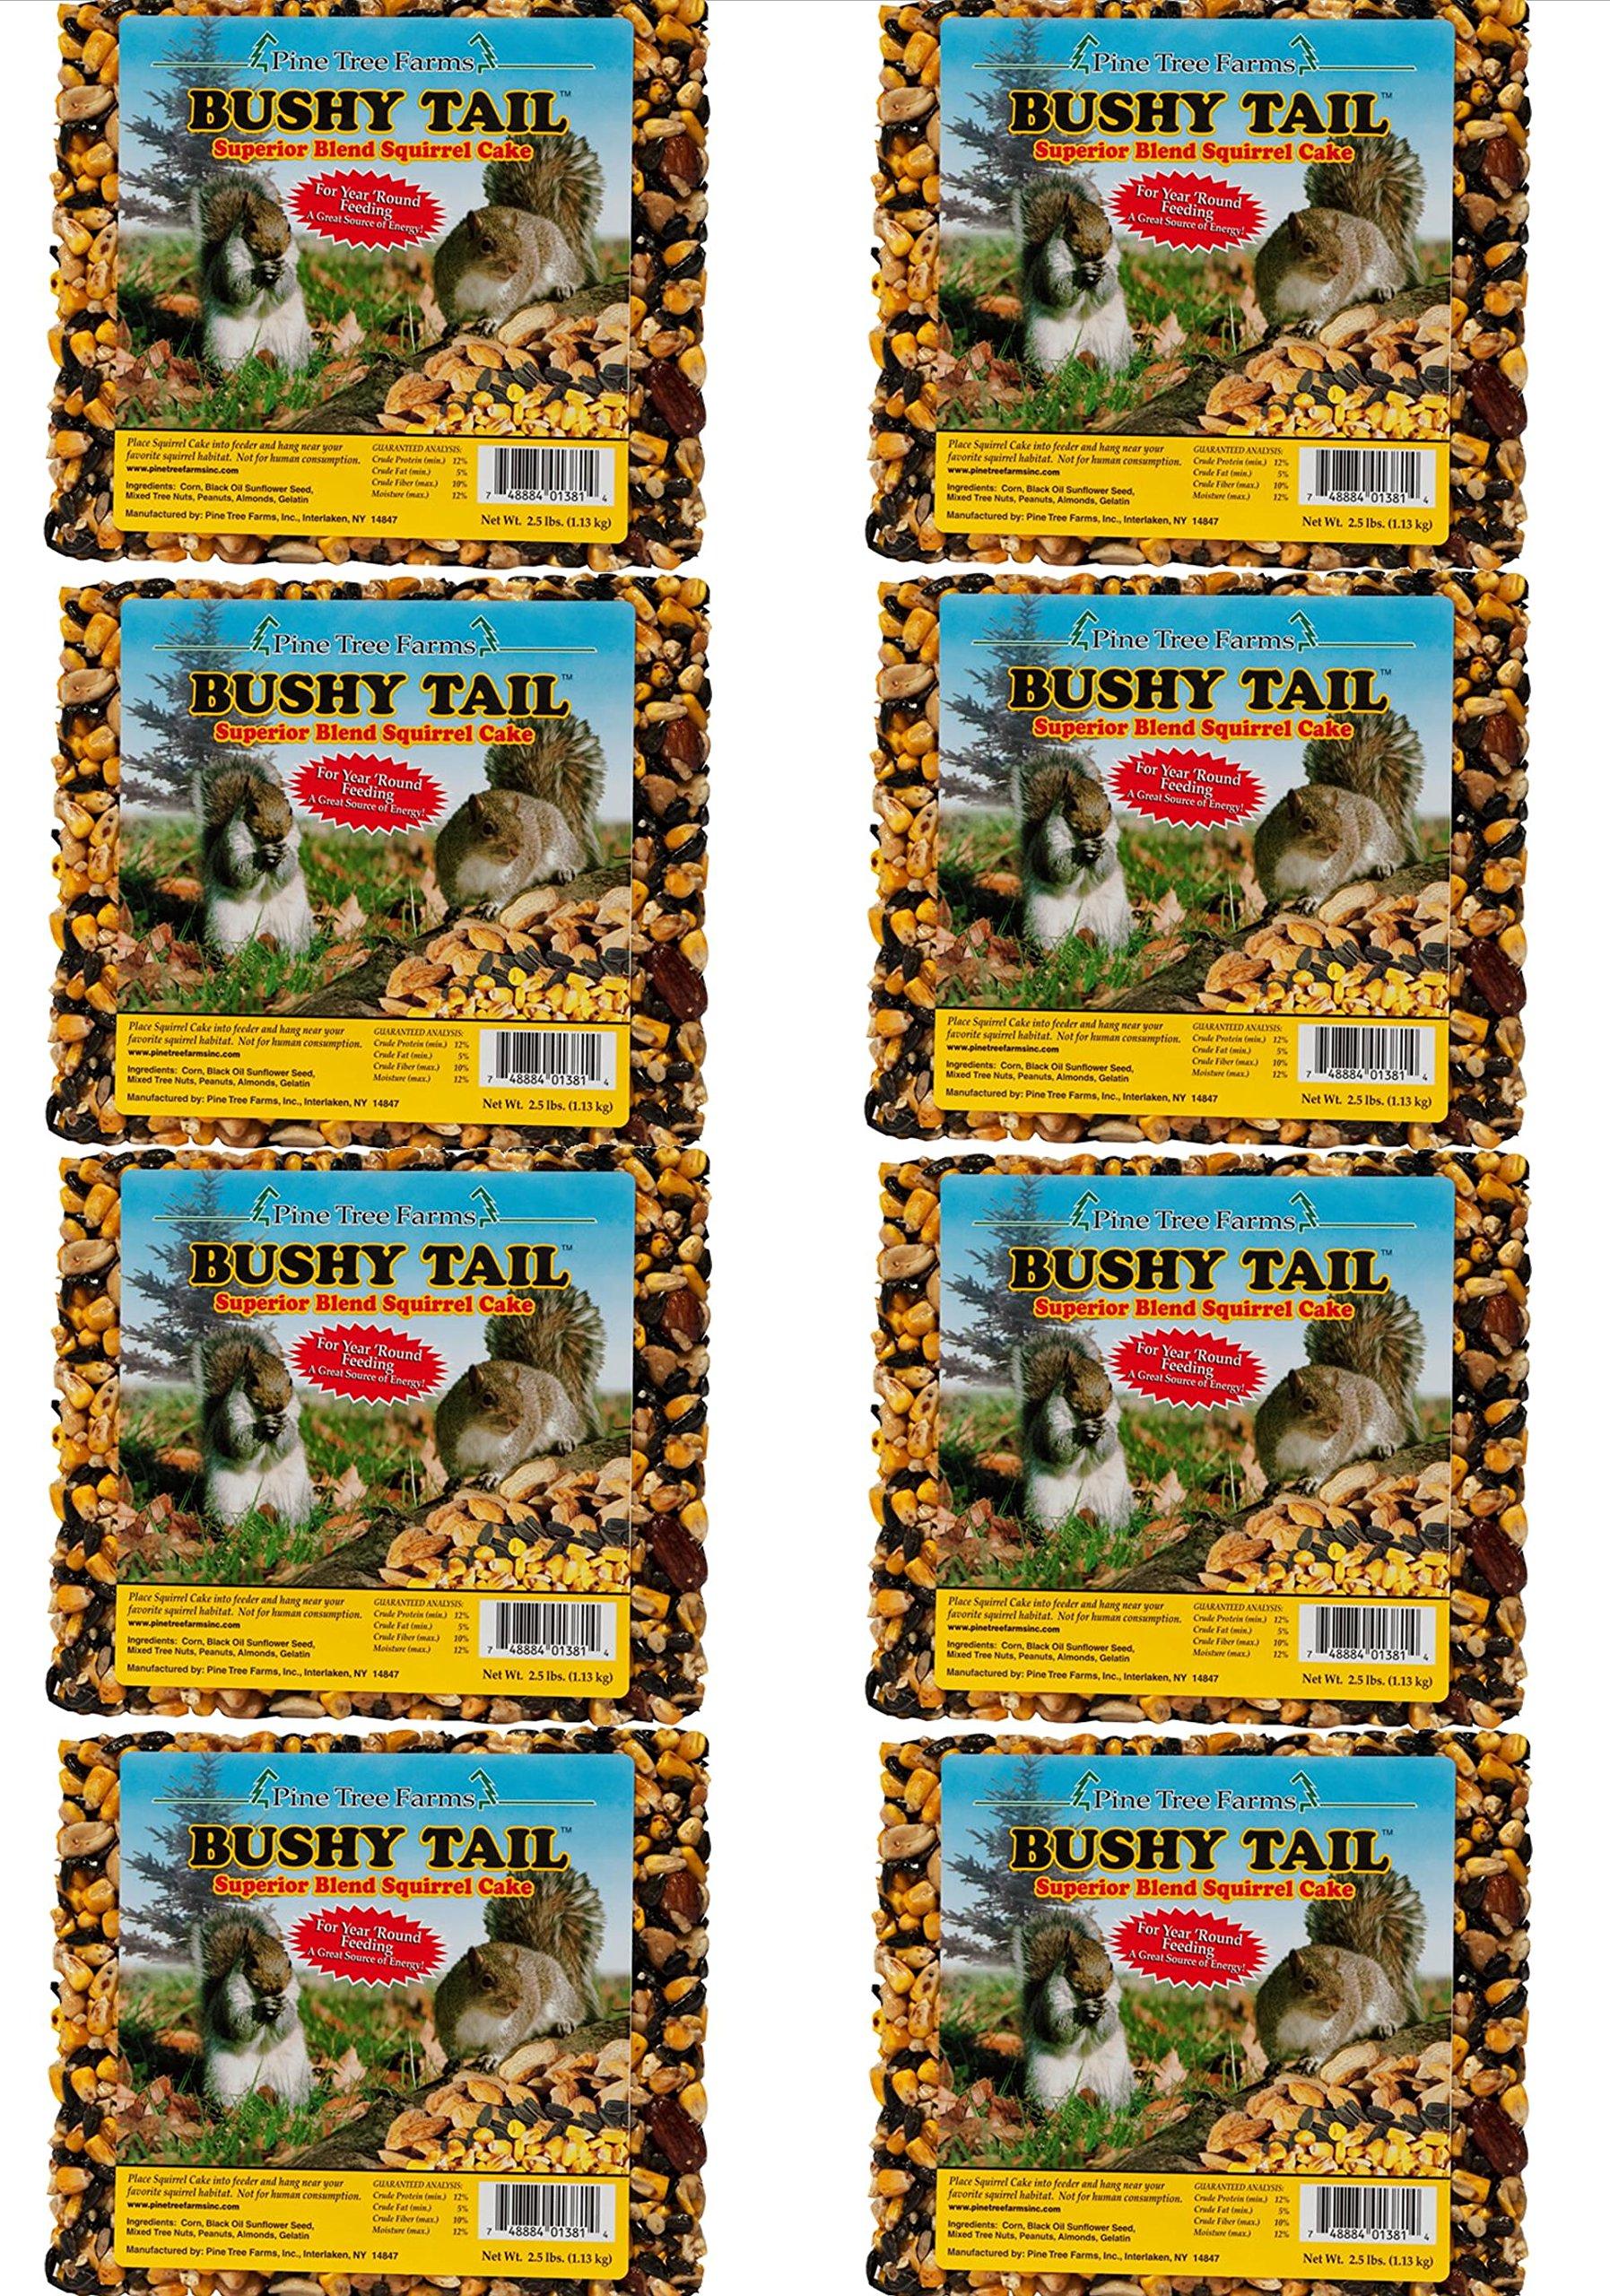 Pine Tree Farms 8 Pack, 1381 Bushy Tail 2.5 Pound Squirrel Cake